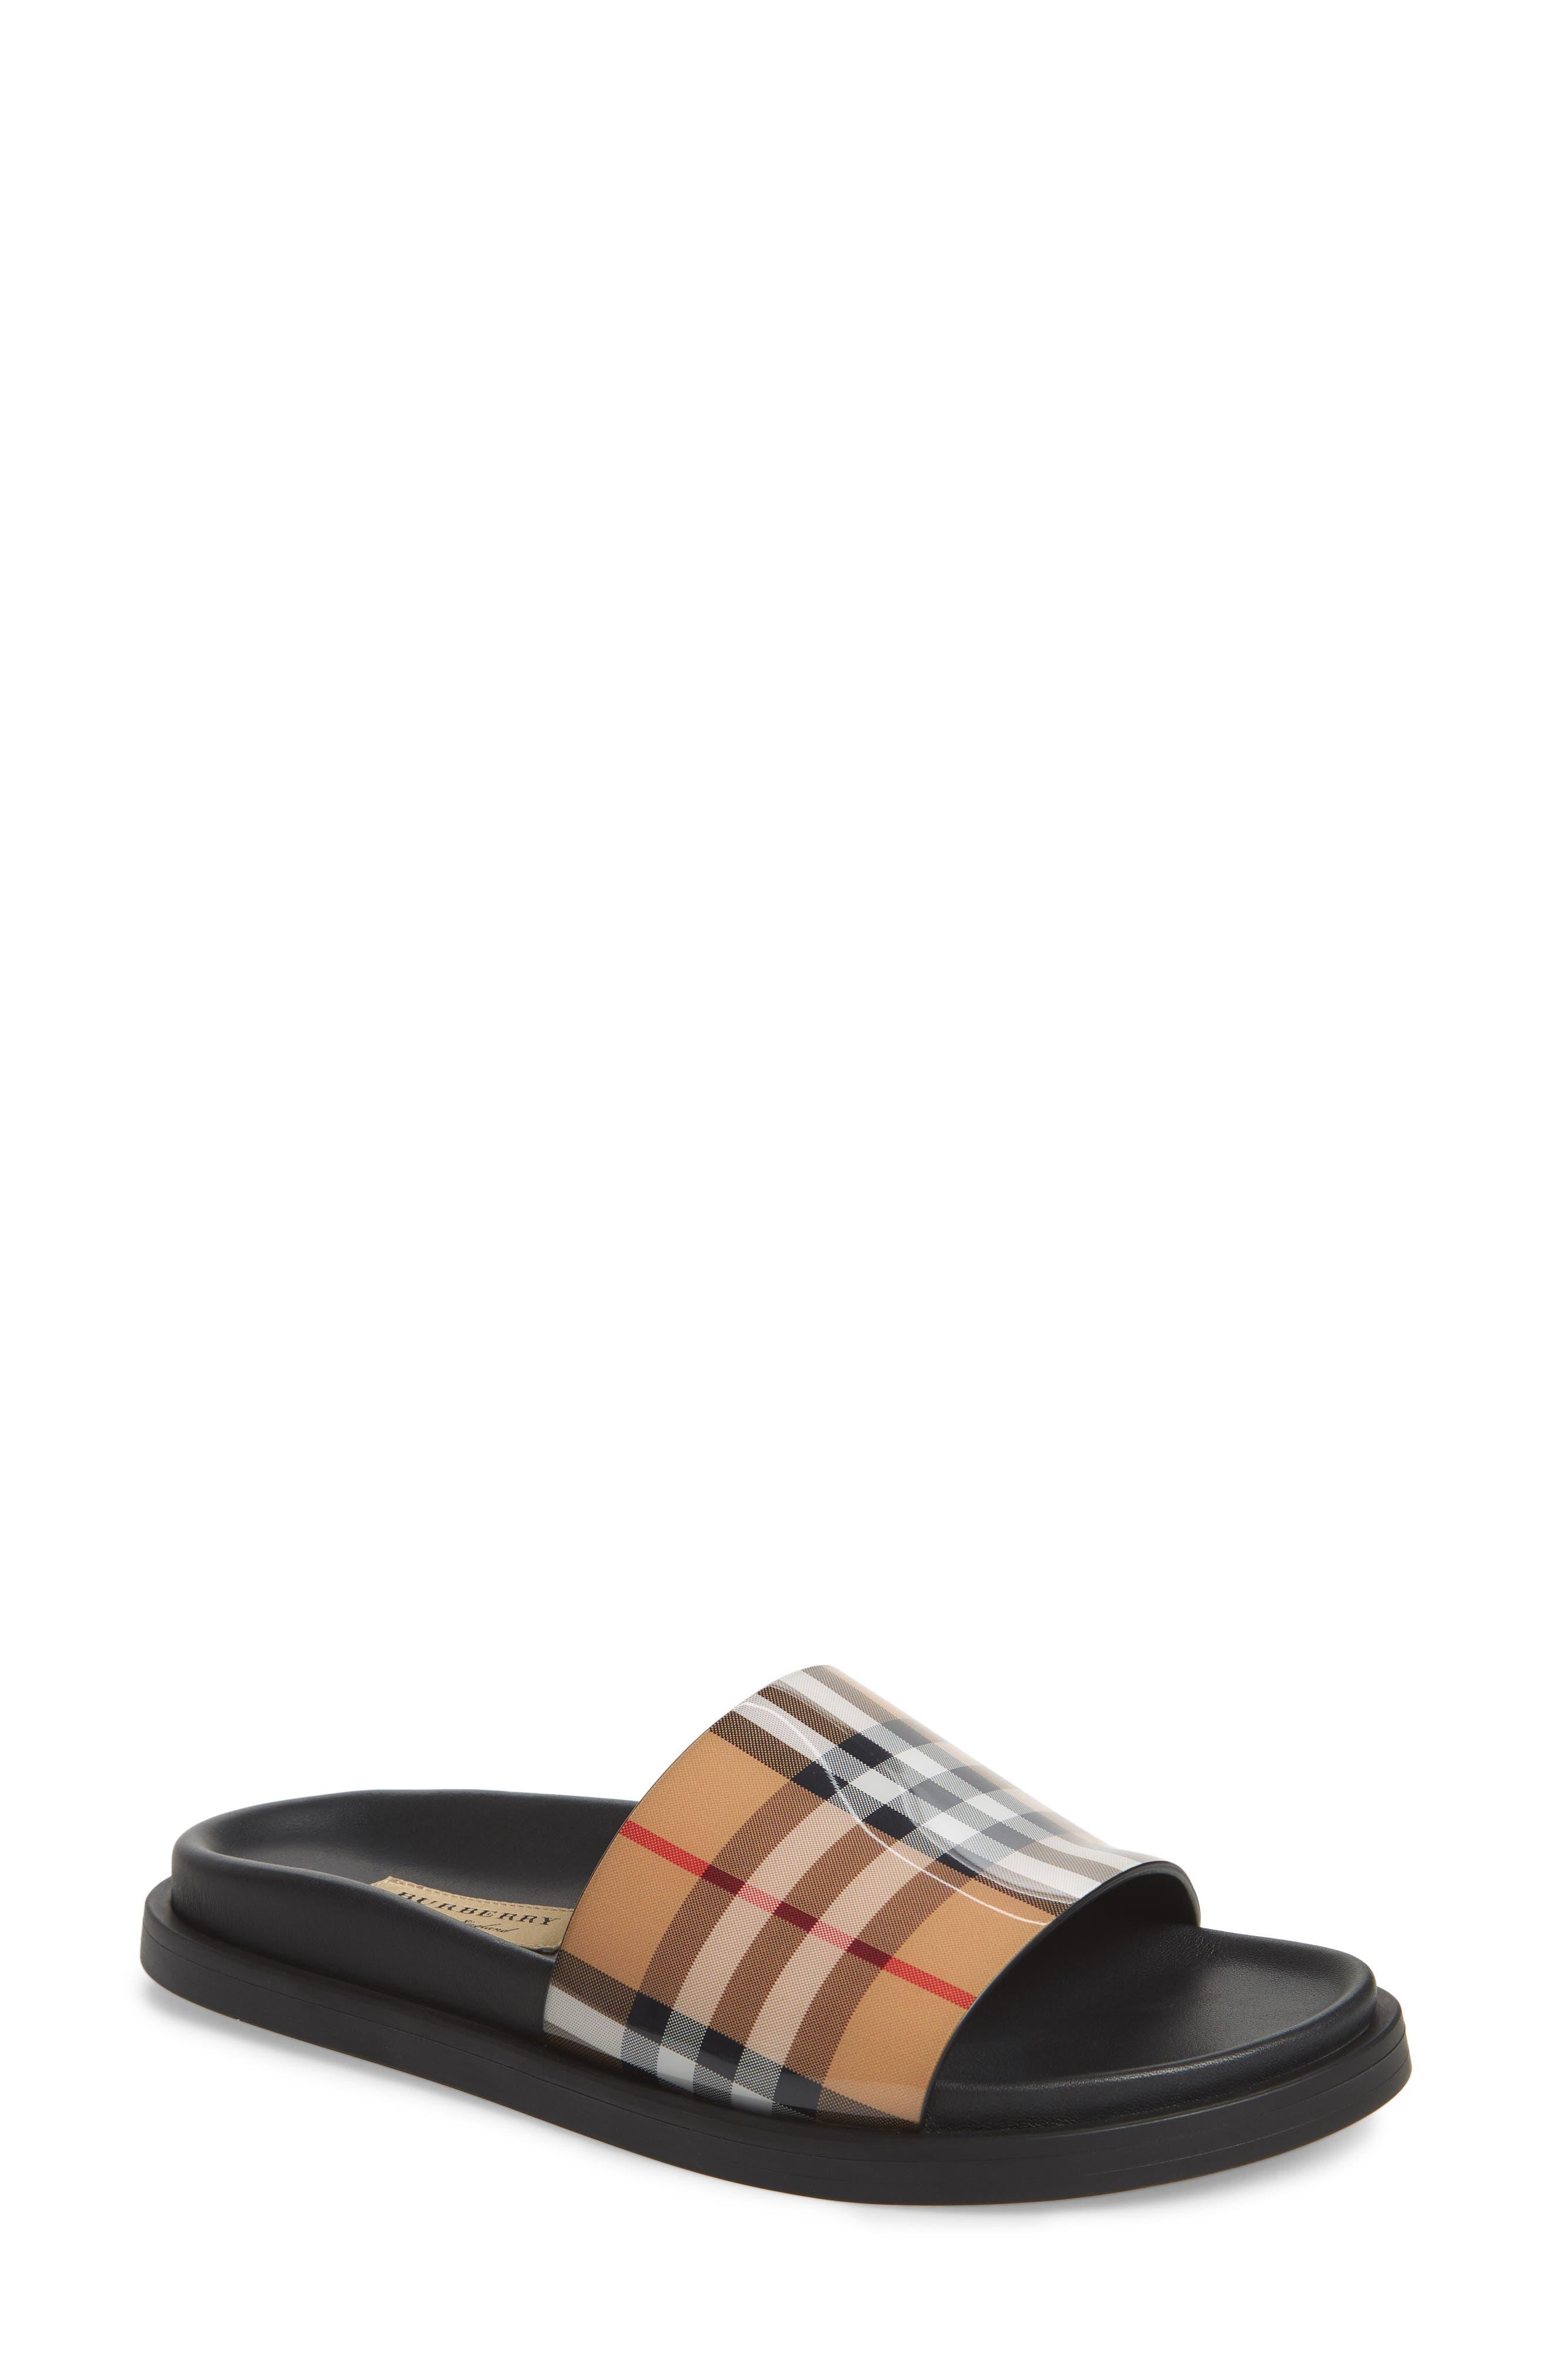 Burberry Vintage Check Slide Sandal (Women)